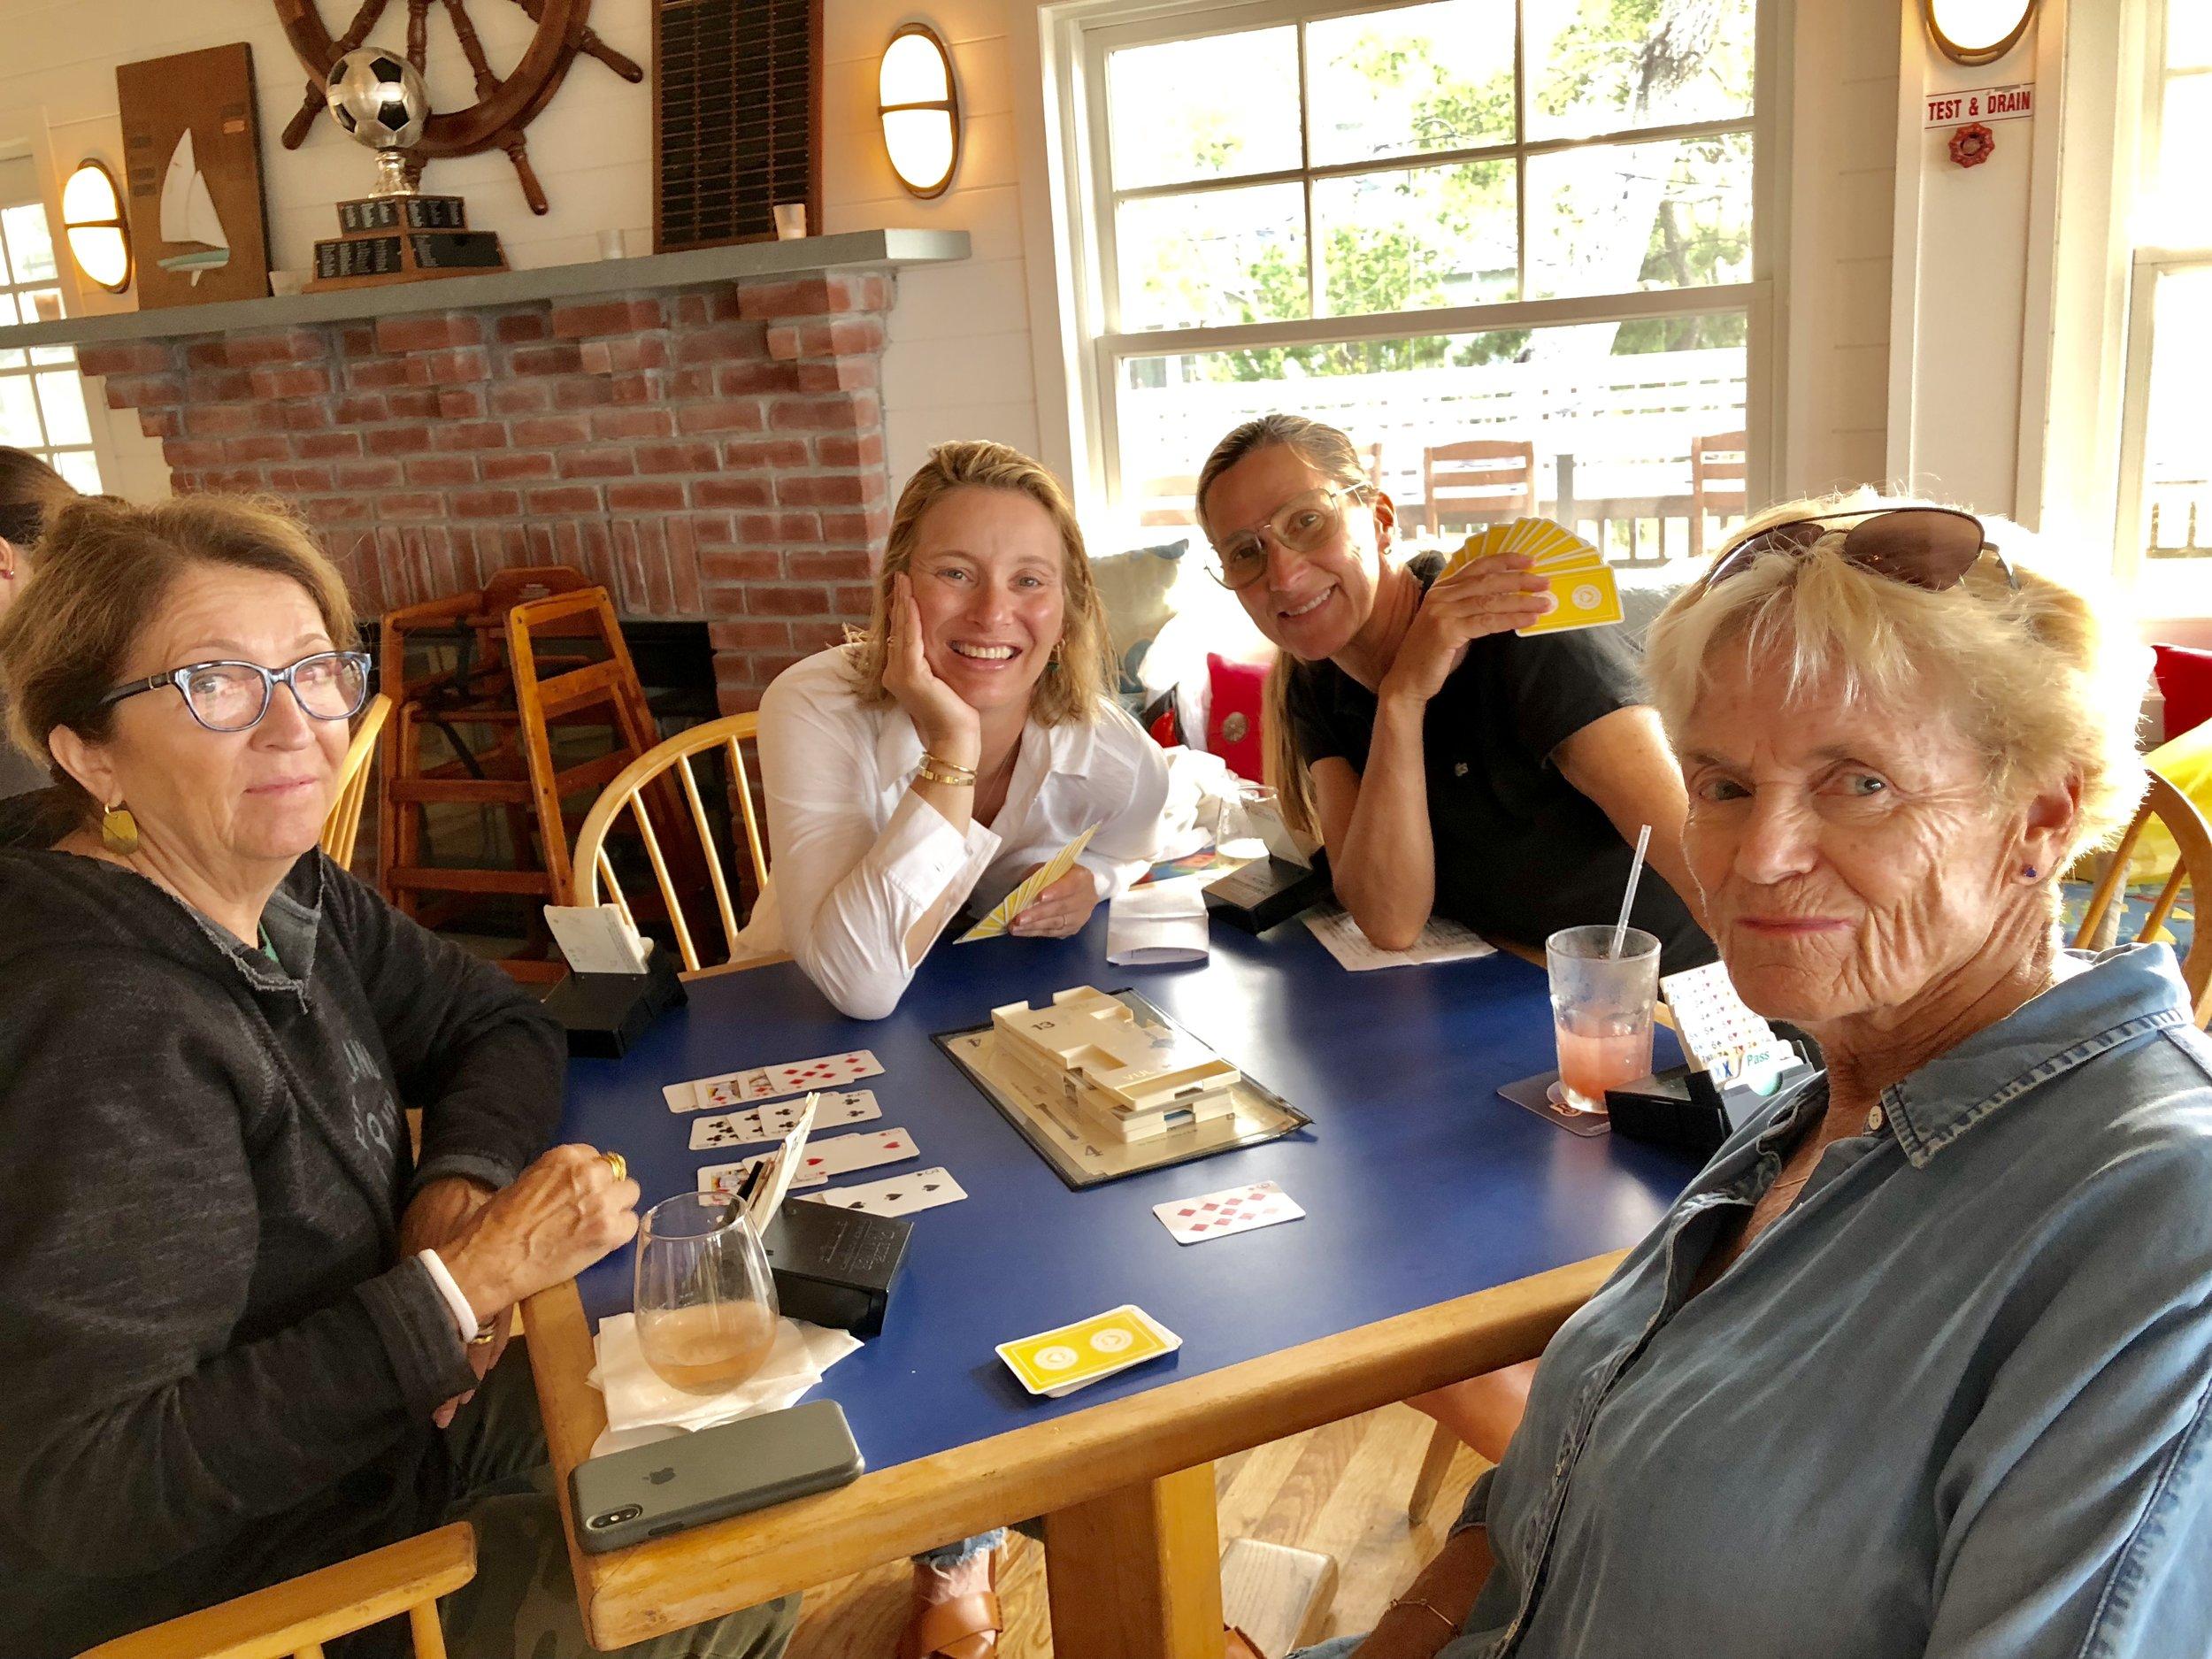 Bridge - Angela Kamen (instructor), Hildy Kuryk, Tracy Dockray Rudd, Clare Briody (instructor)